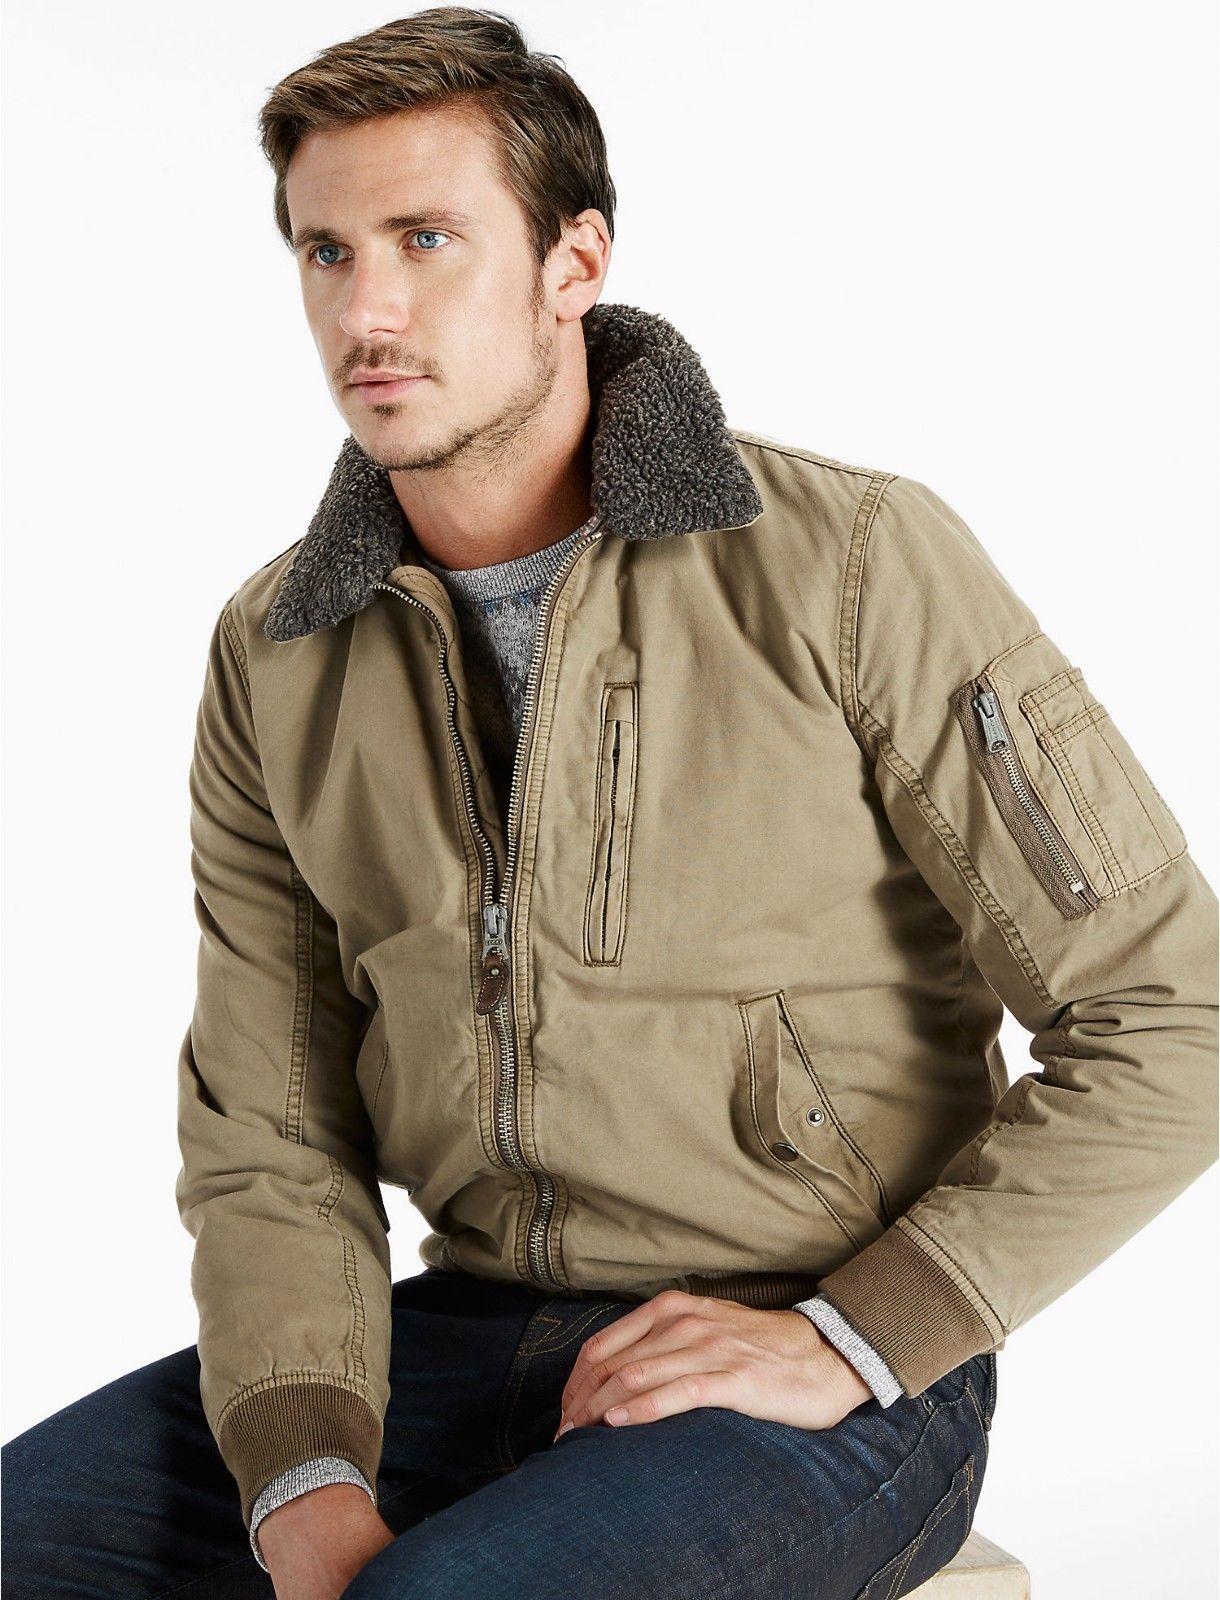 NEW Men's Lucky Brand B-15 Flight Jacket Olive Green Military Coat LRG  $169